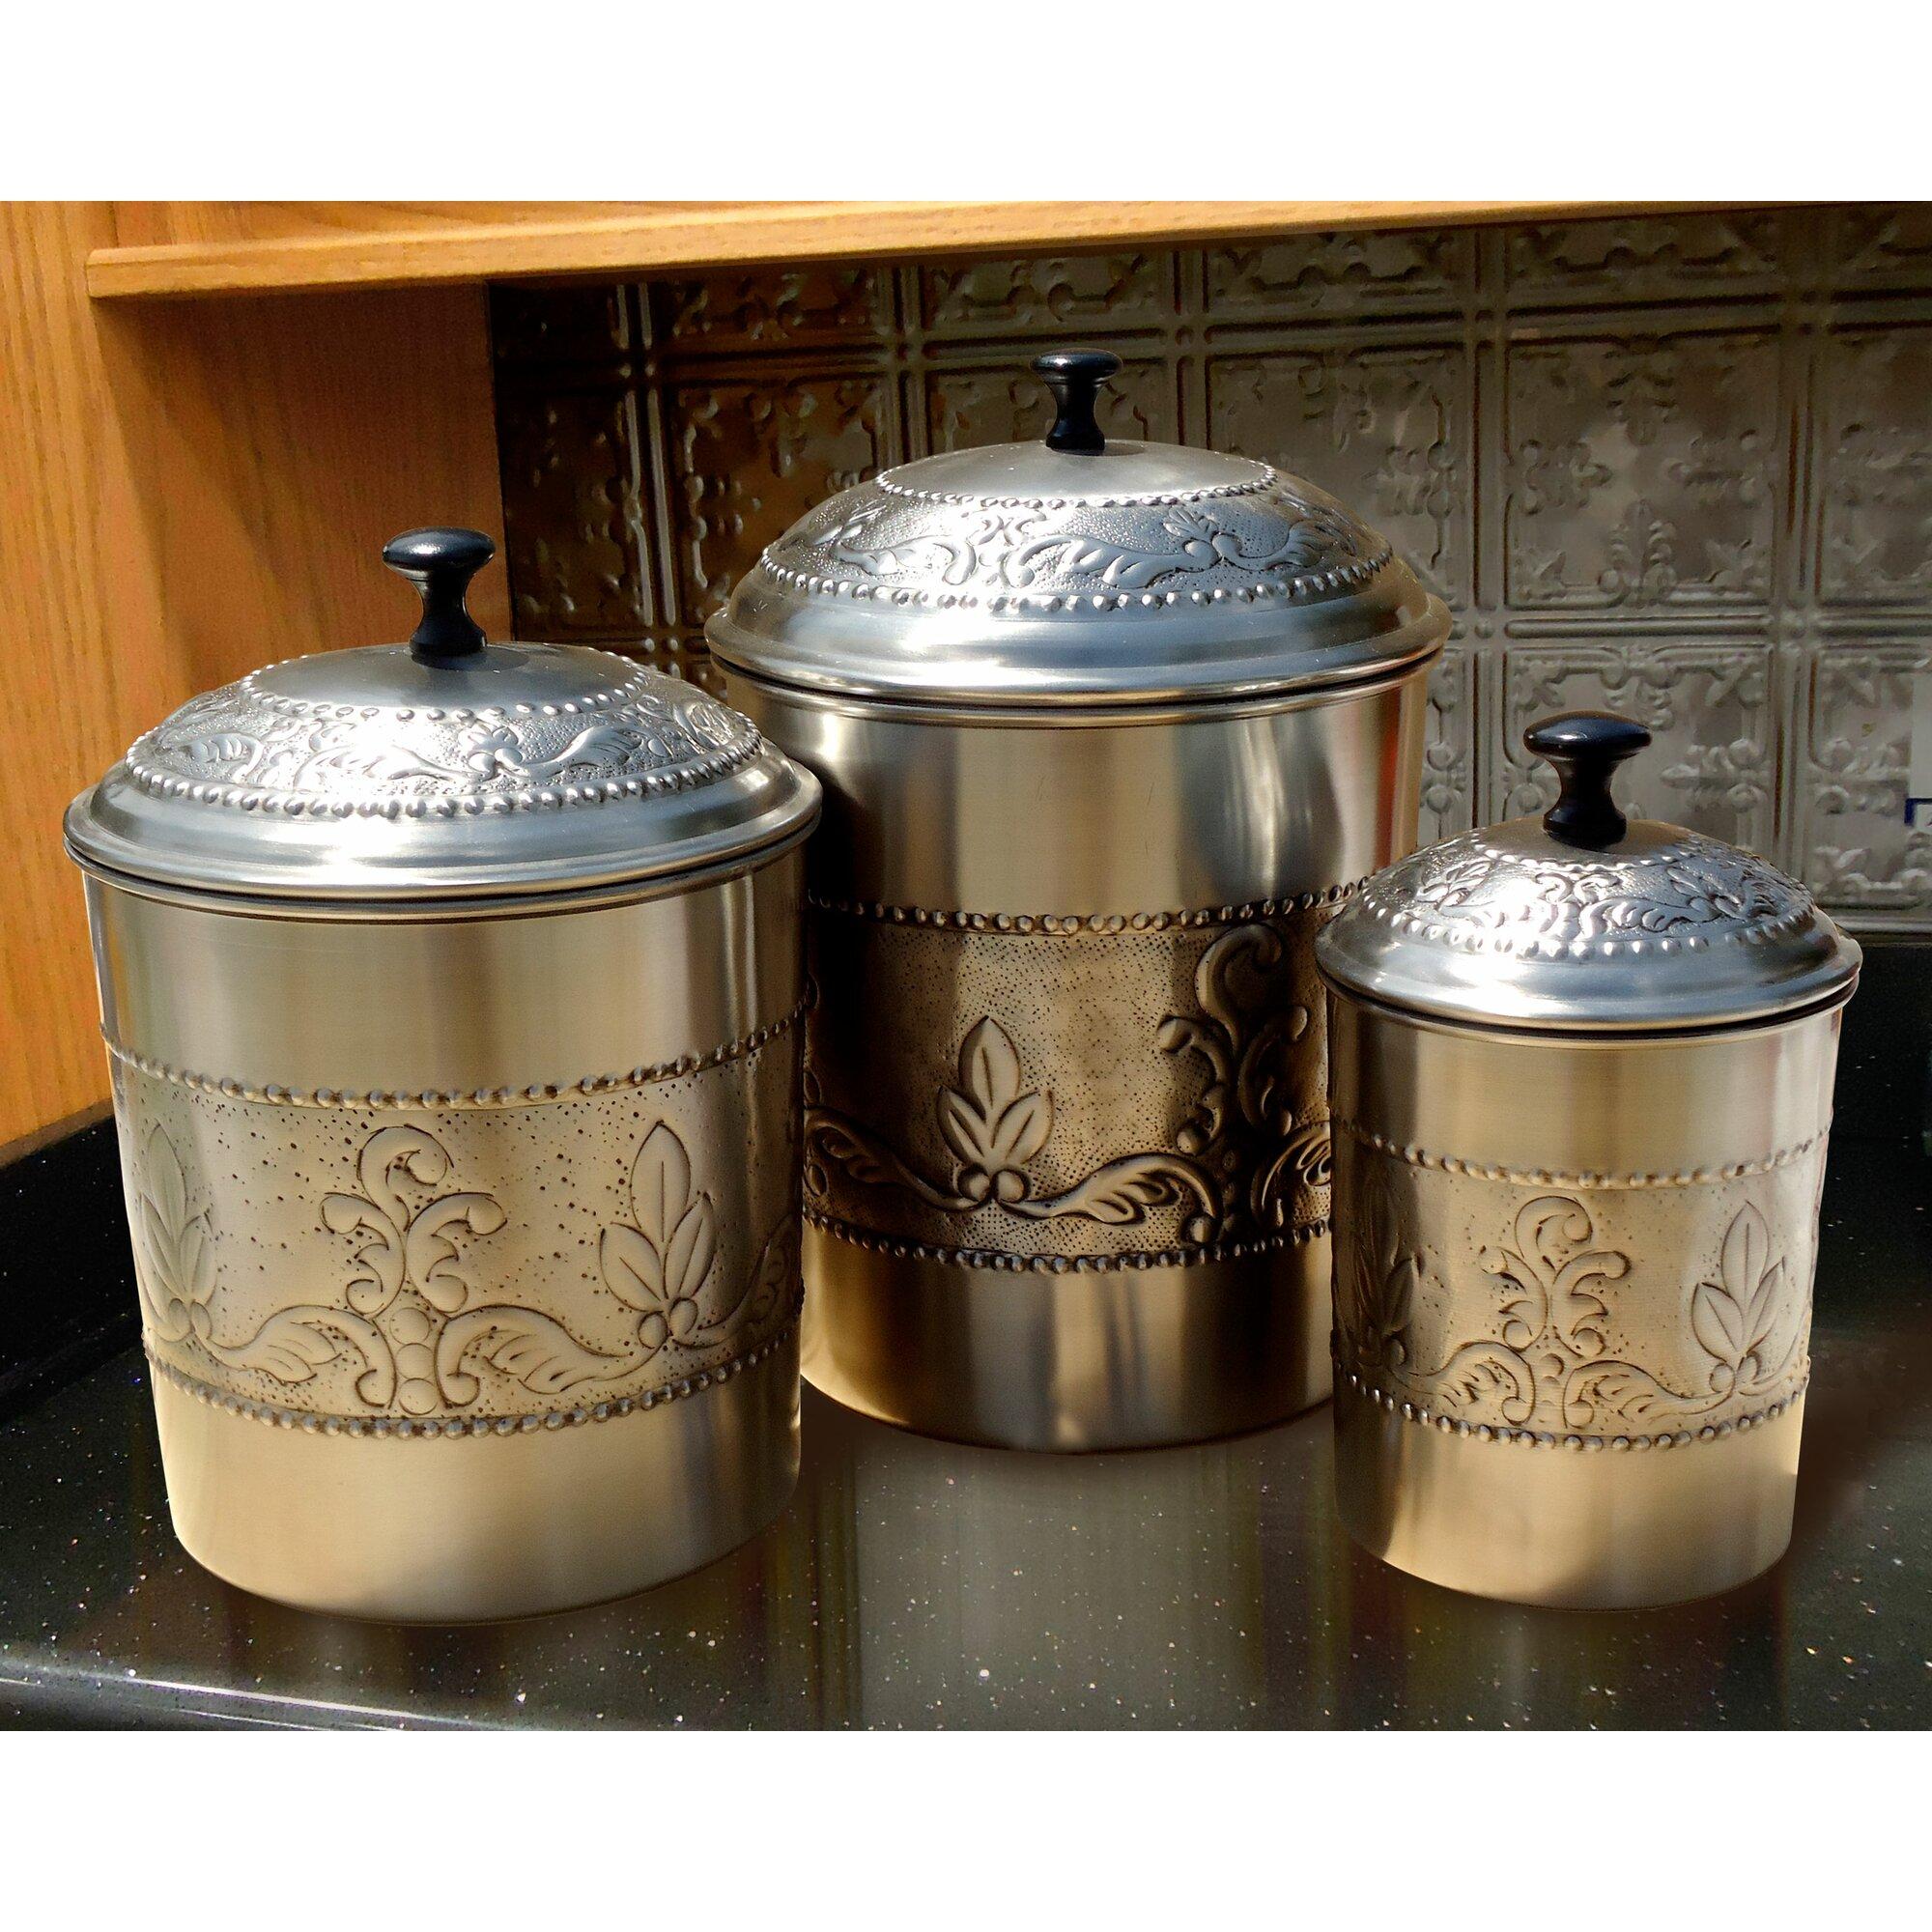 canister set etsy rustic kitchen canister set detrit us old dutch victoria 3 piece kitchen canister set reviews wayfair